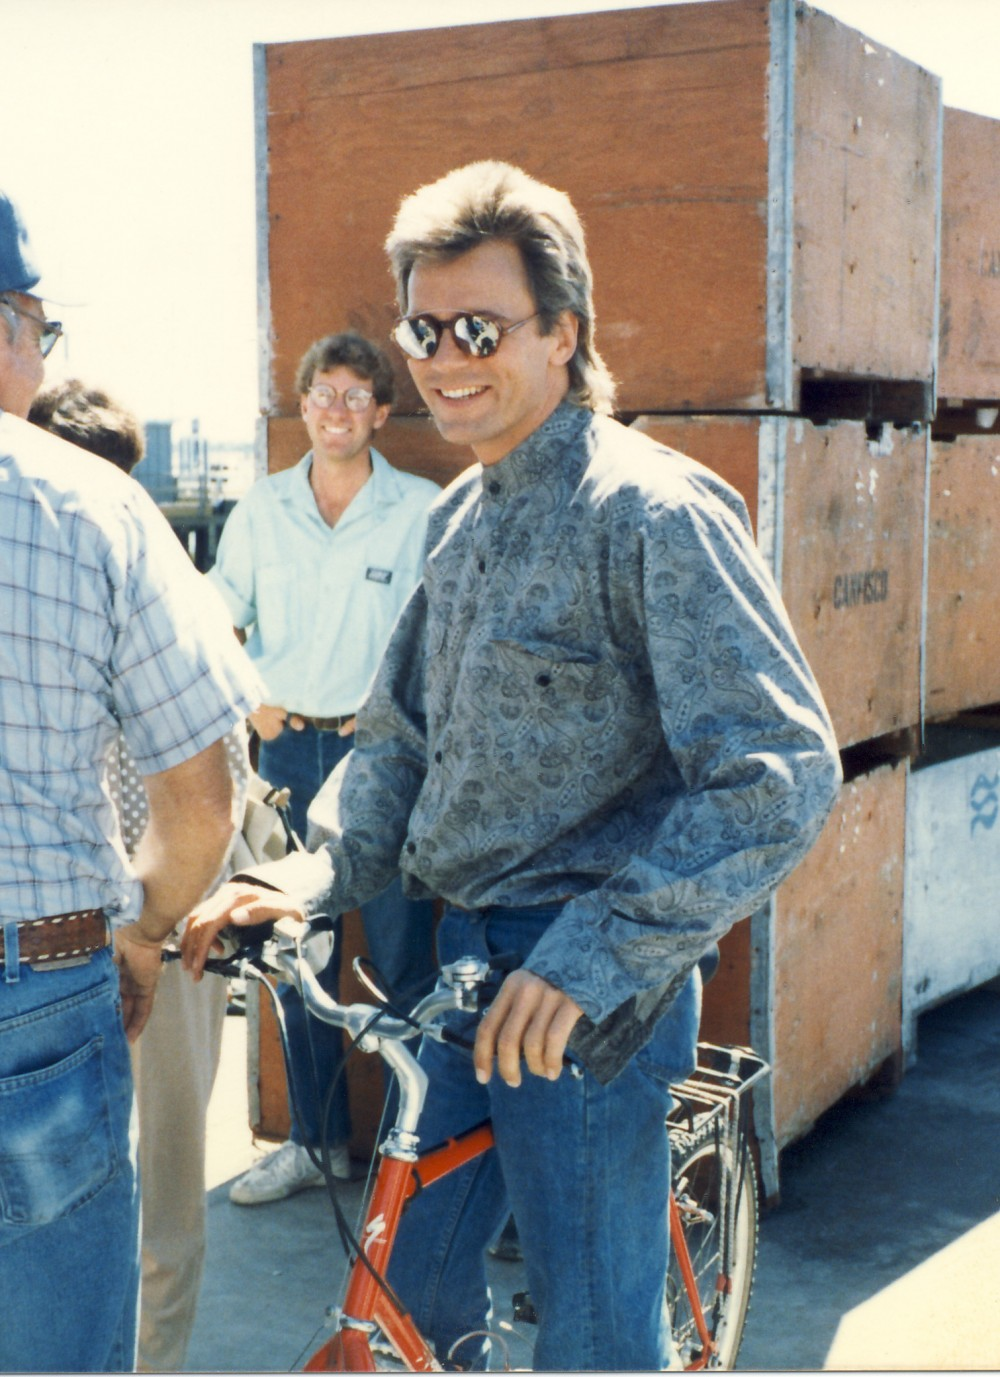 Richard-dean-anderson-1985